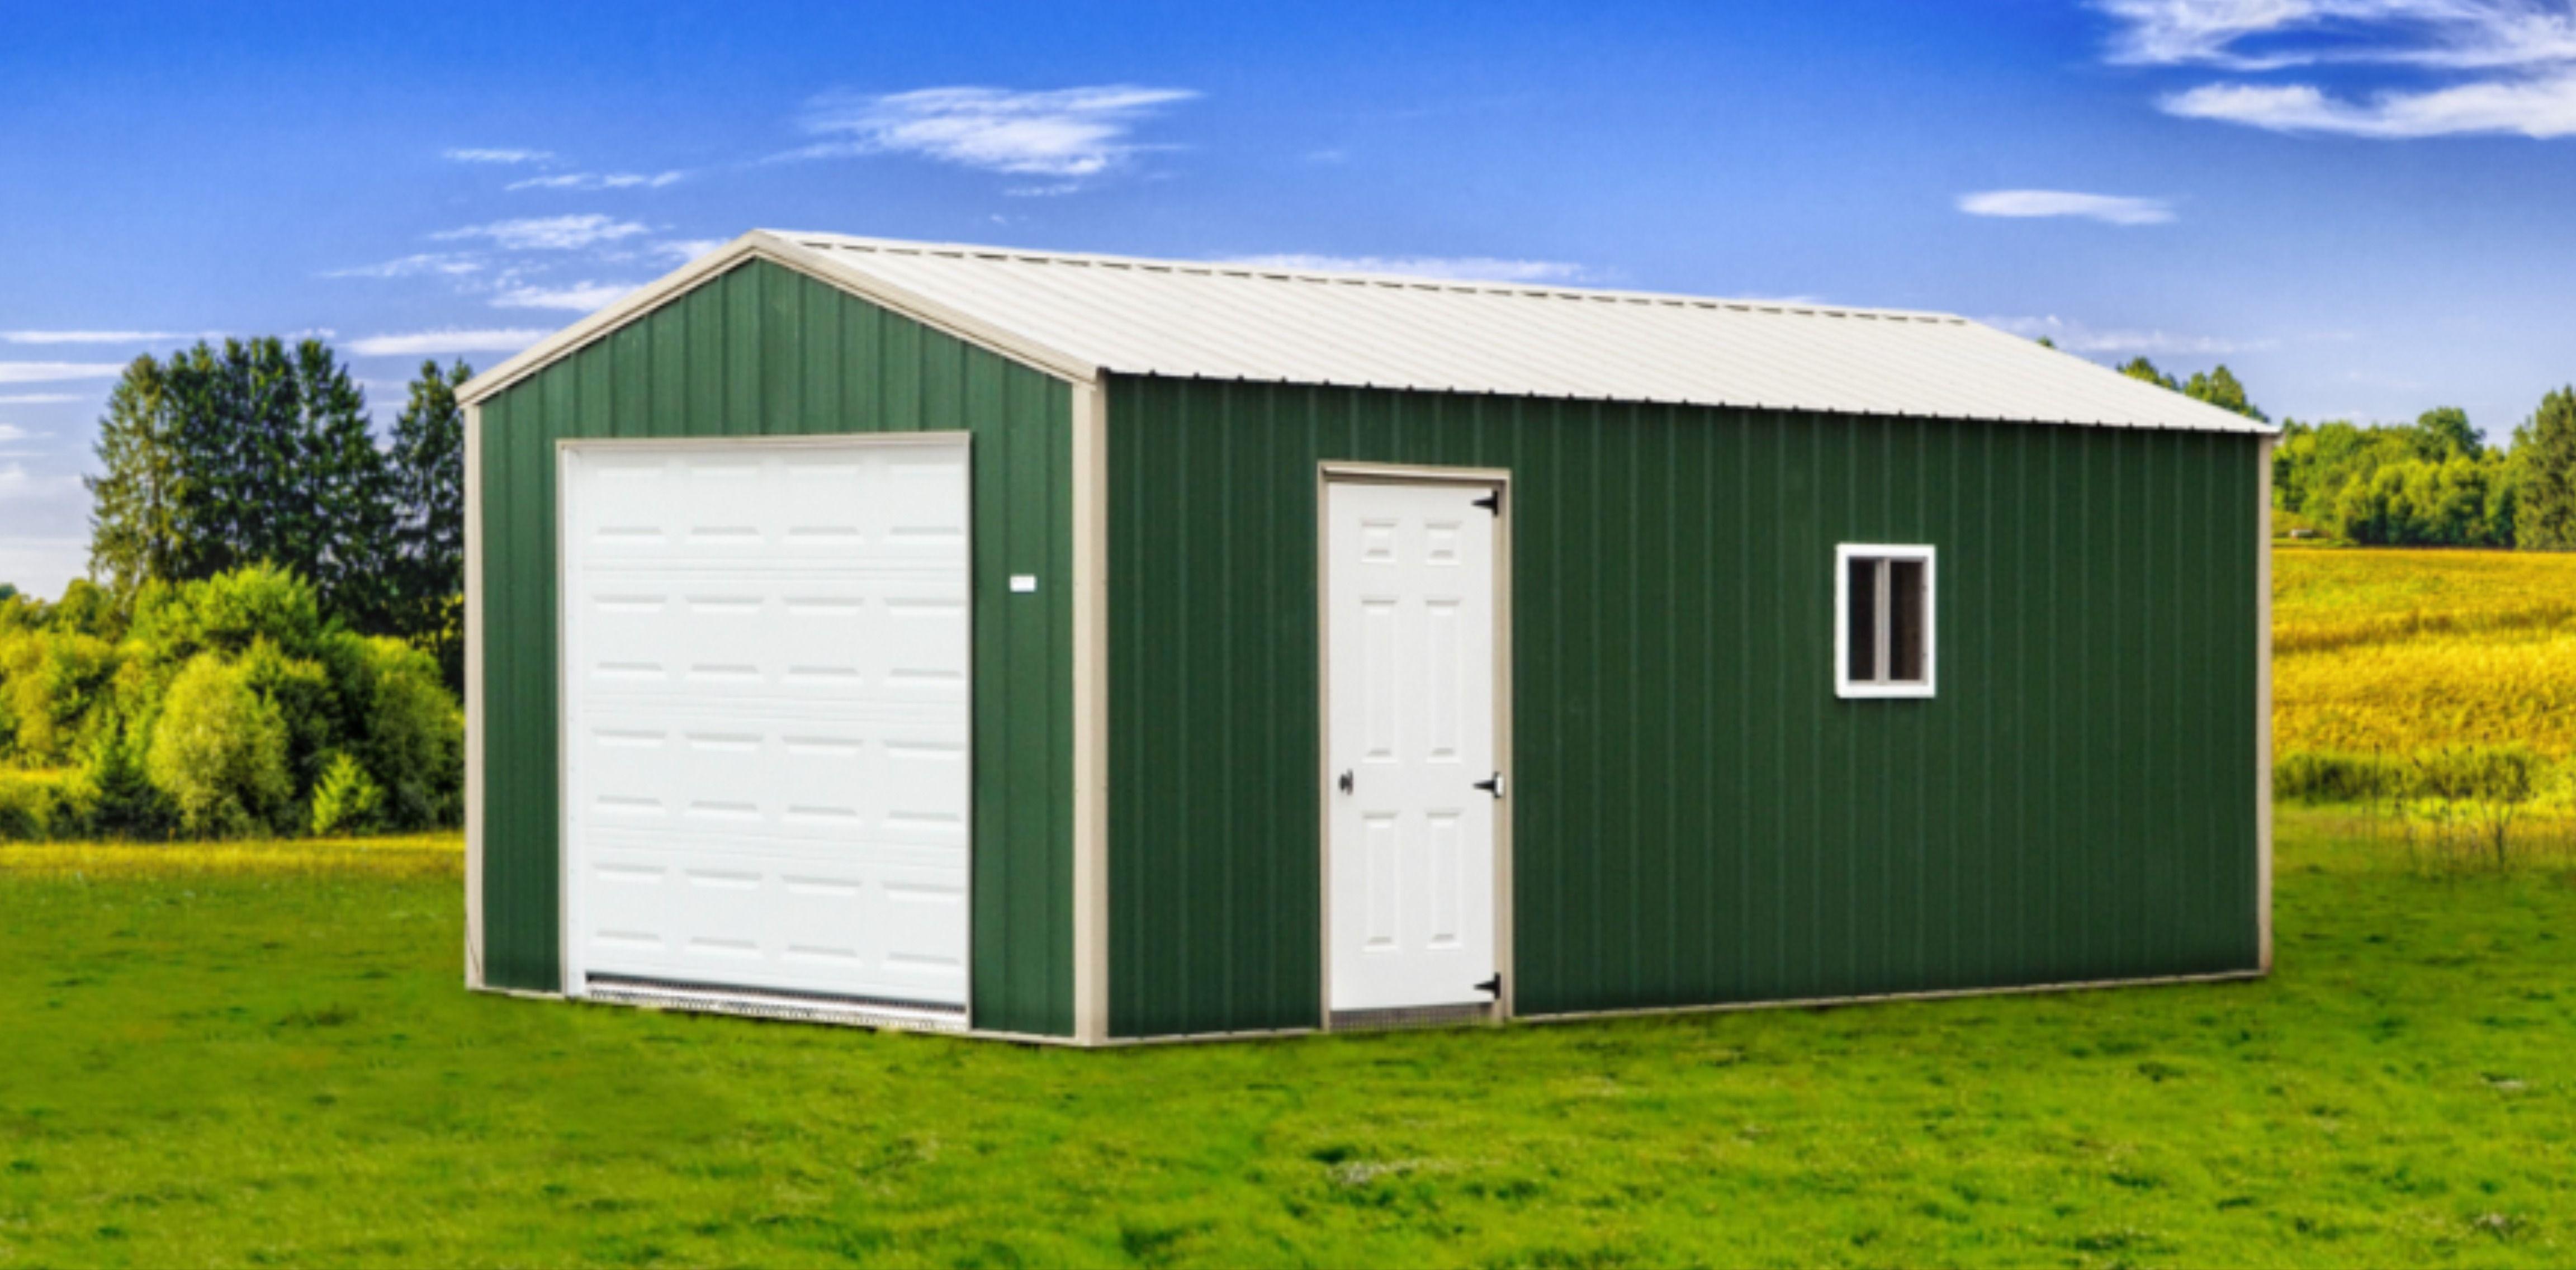 Garage In 2020 Built In Storage Portable Storage Buildings Portable Garage